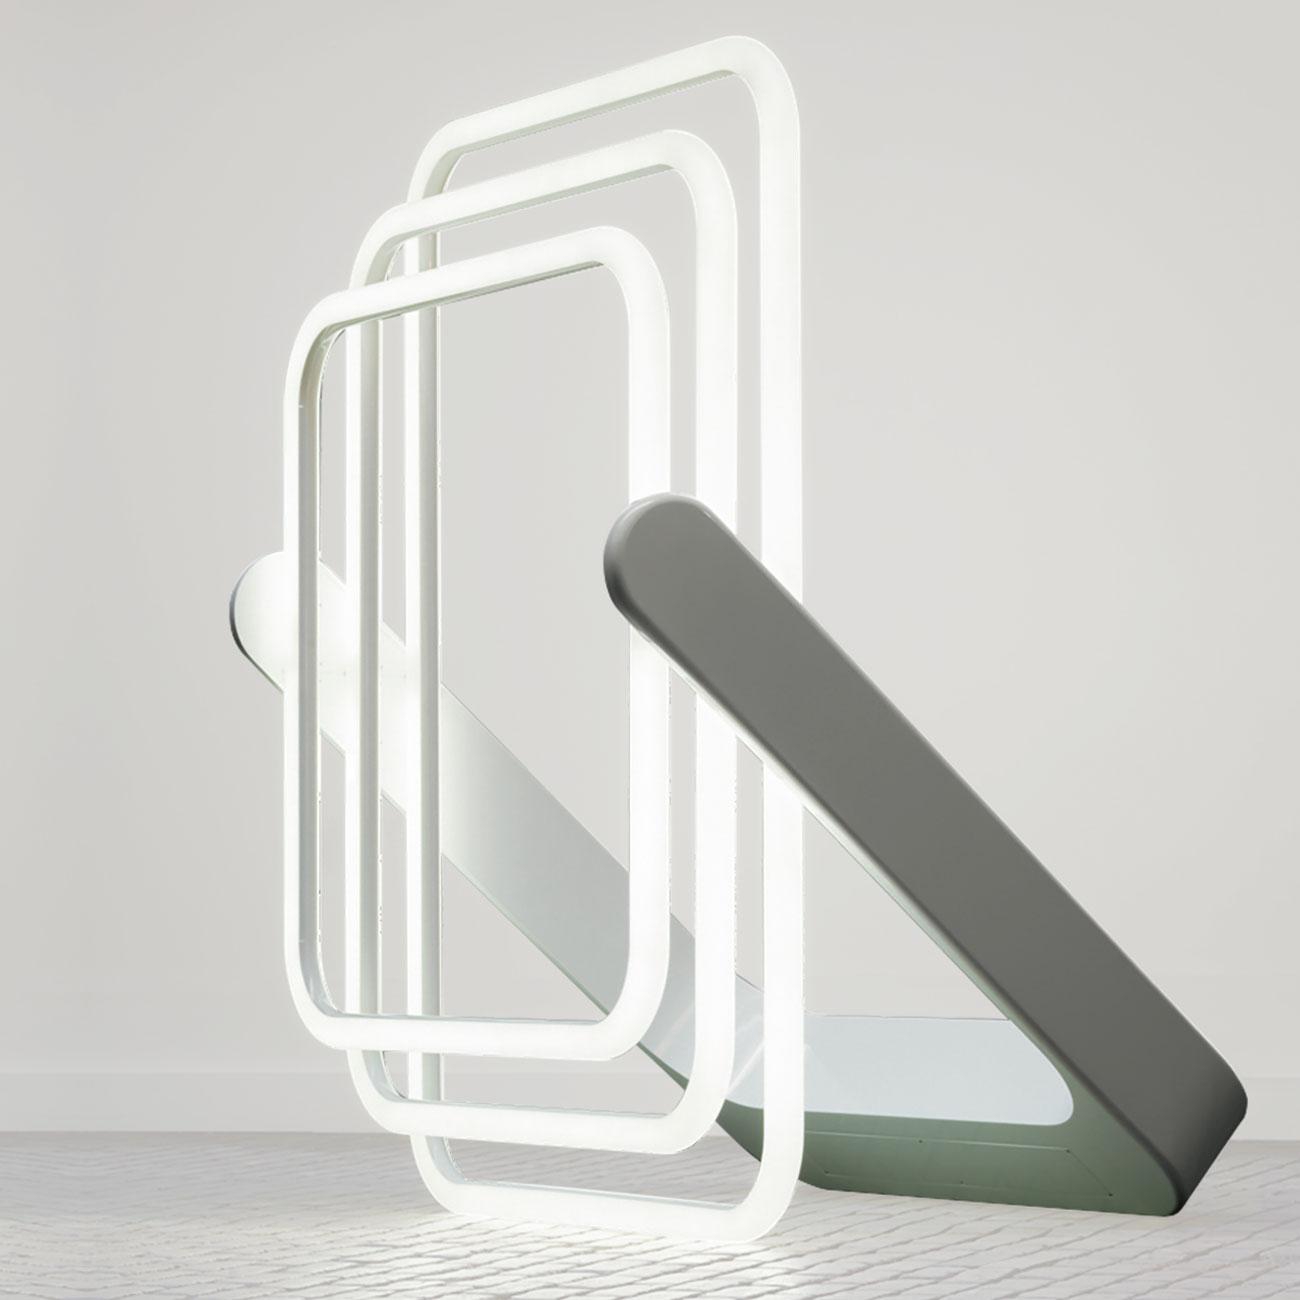 3CL (2015) de Philippe Nadson. Lampe en PMMA et LED. Galerie Perpitch & Bringand, www.perpitch-bringand.com